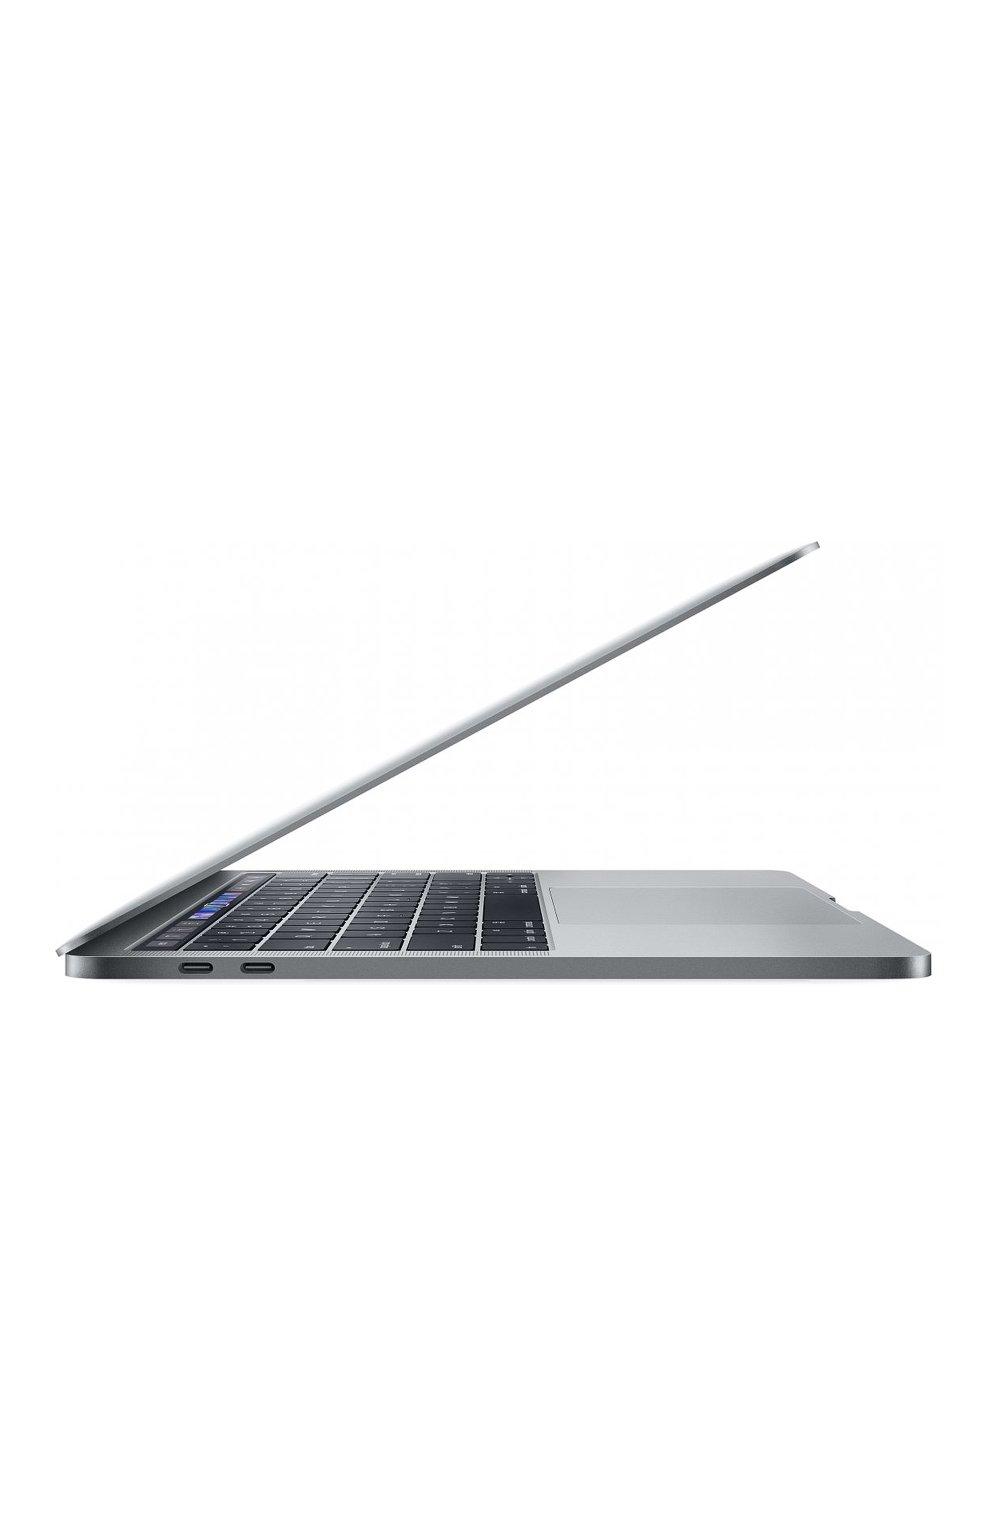 "MacBook Pro 13"" с панелью Touch Bar со встроенным датчиком Touch ID Quad-Core i5 2.3GHz 512GB Space Gray Apple    Фото №2"